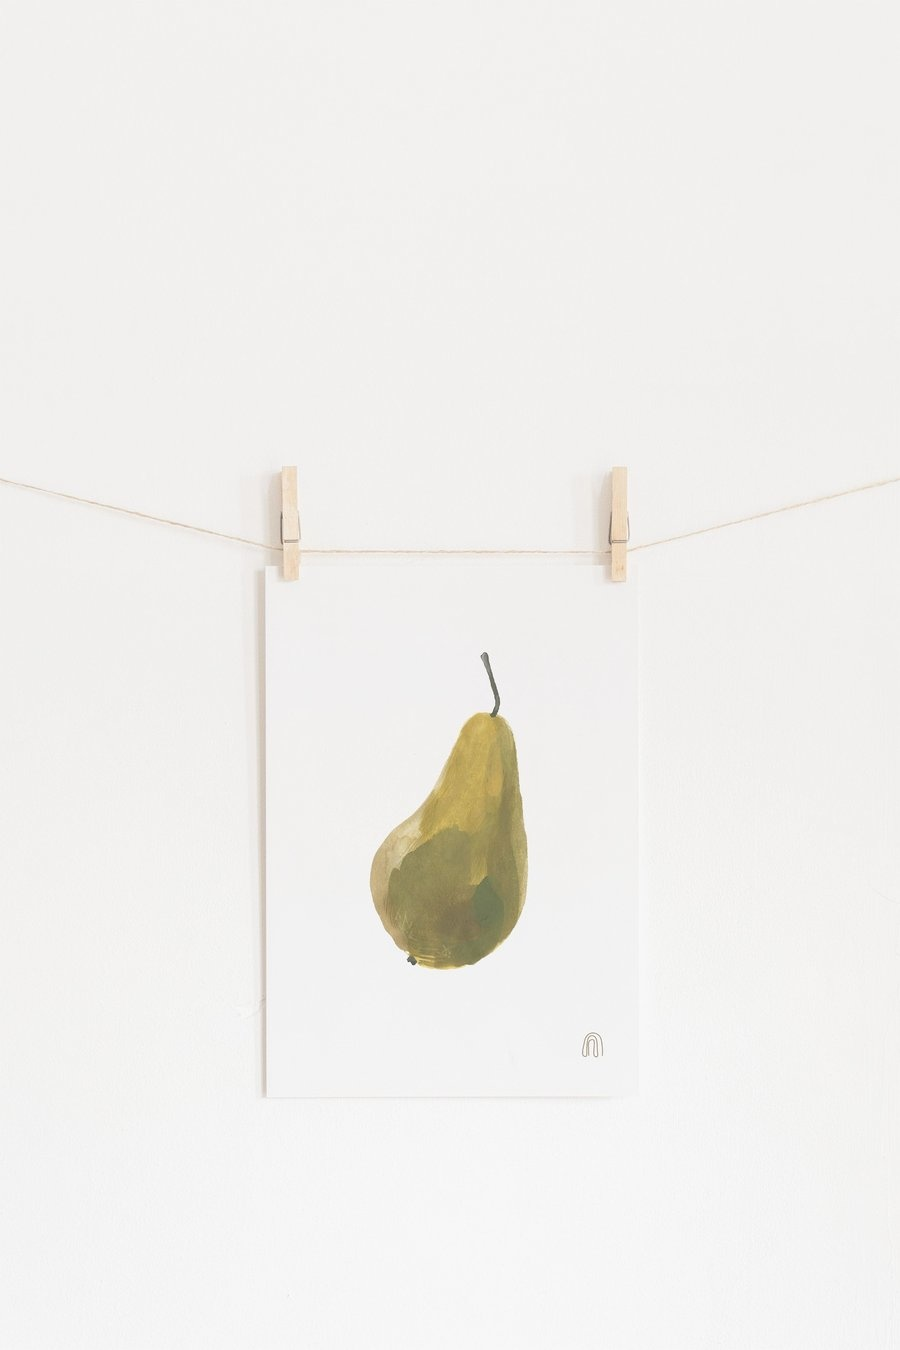 Pear Art poster